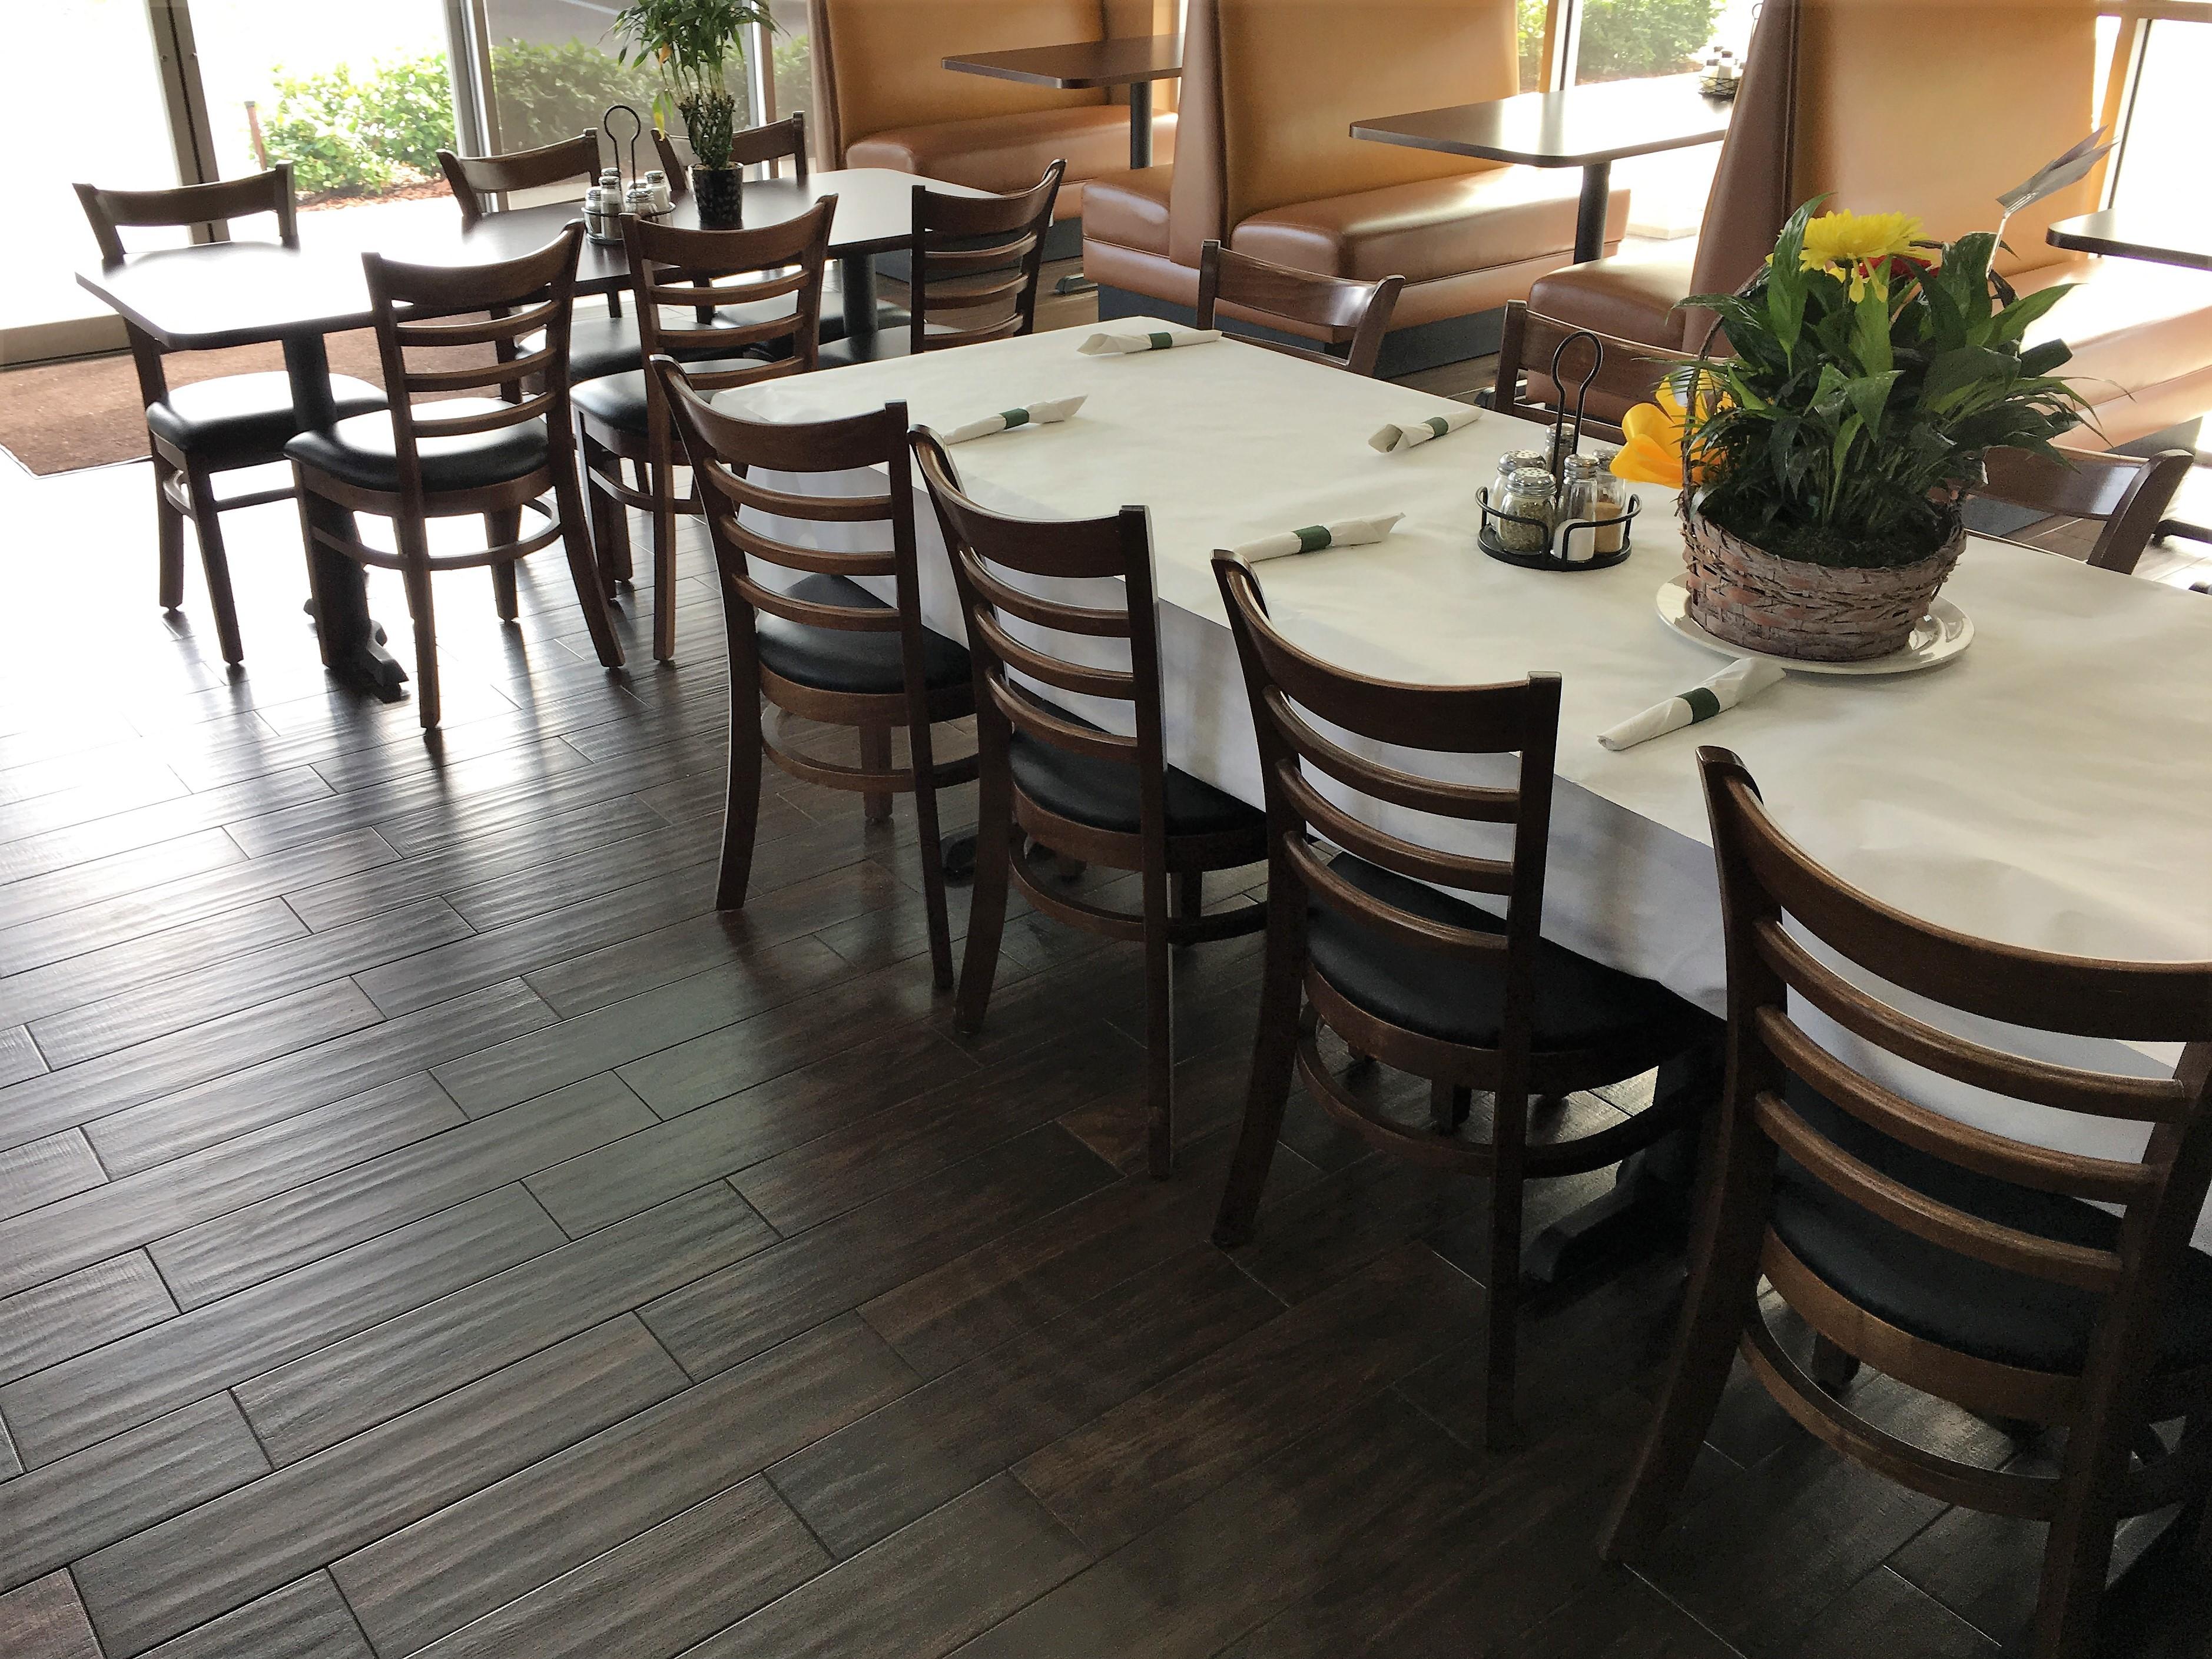 Pizza U0026 Italian Restaurants For Sale In The Central Florida Area